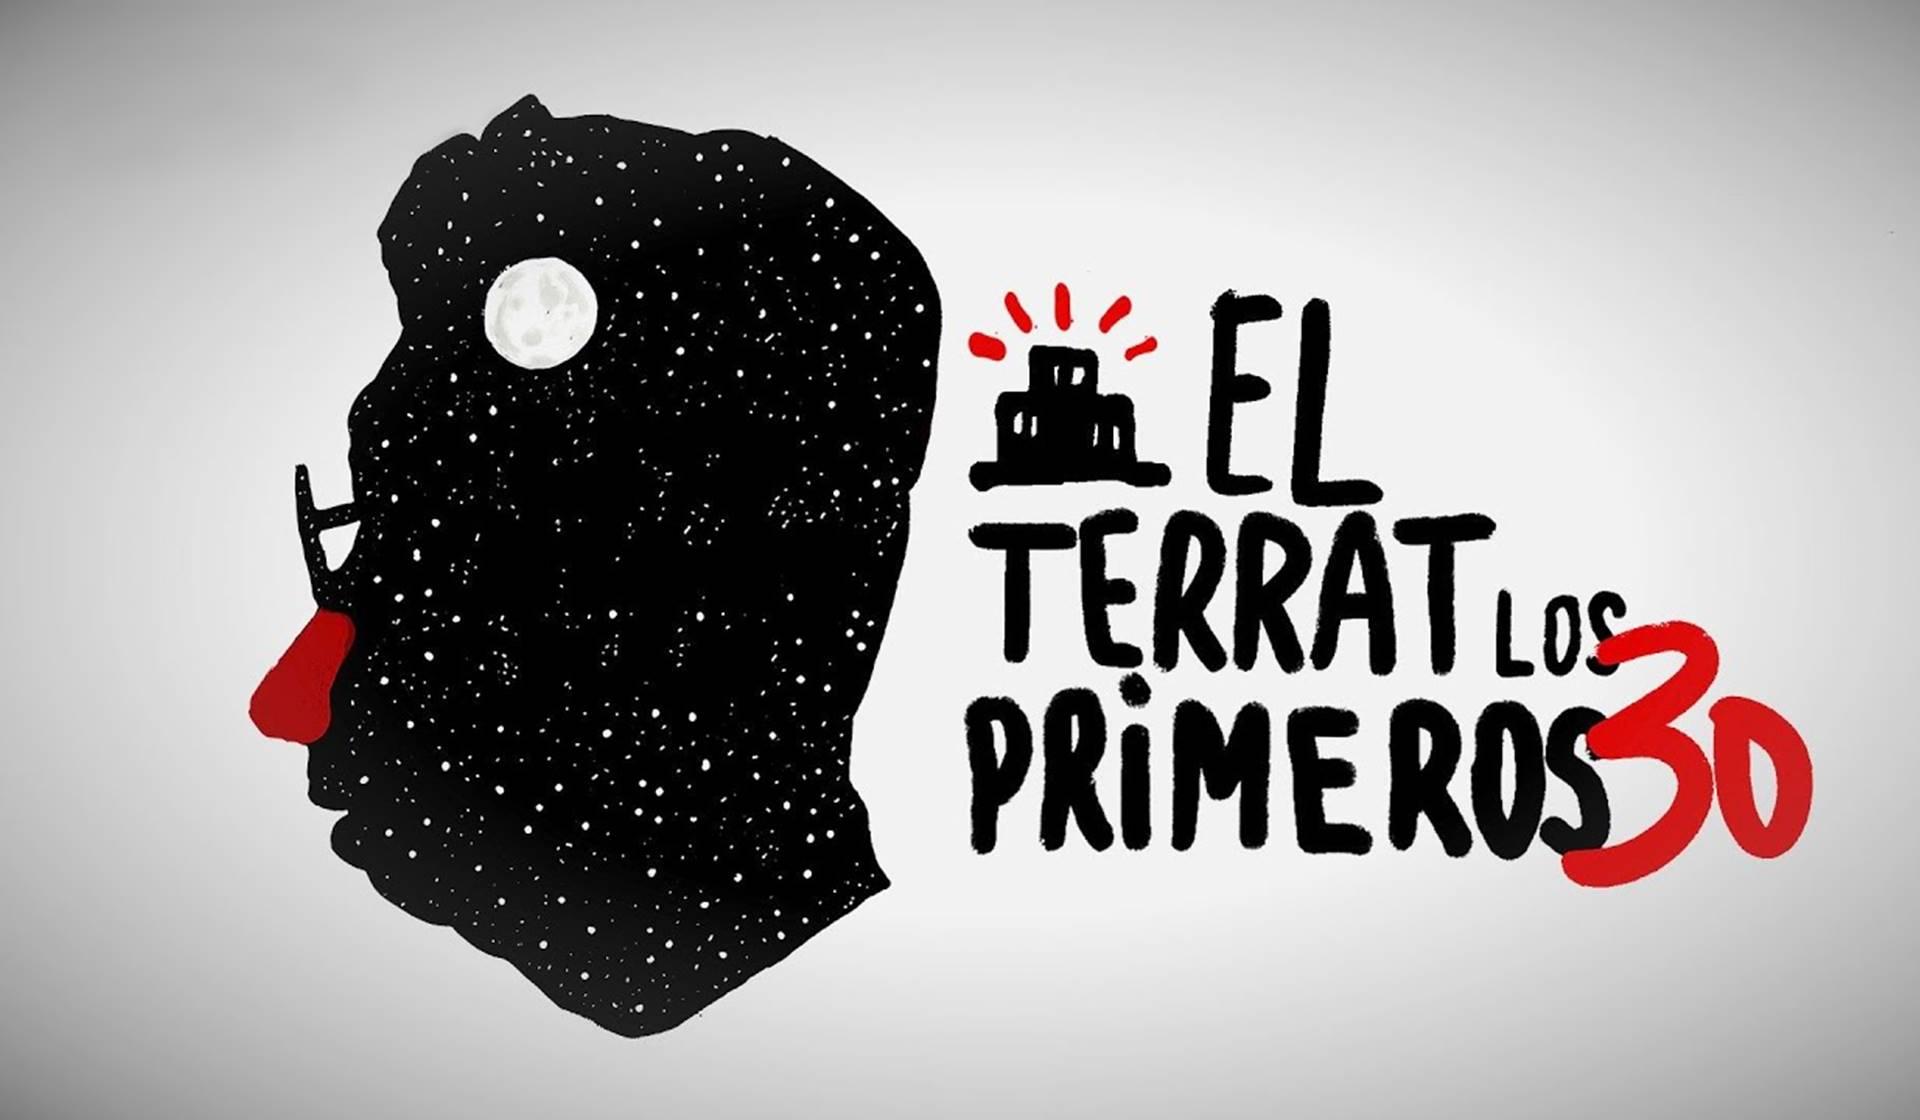 'El Terrat, Los primeros 30' la serie de Filmin que explica la historia de la productora de Andreu Buenafuente